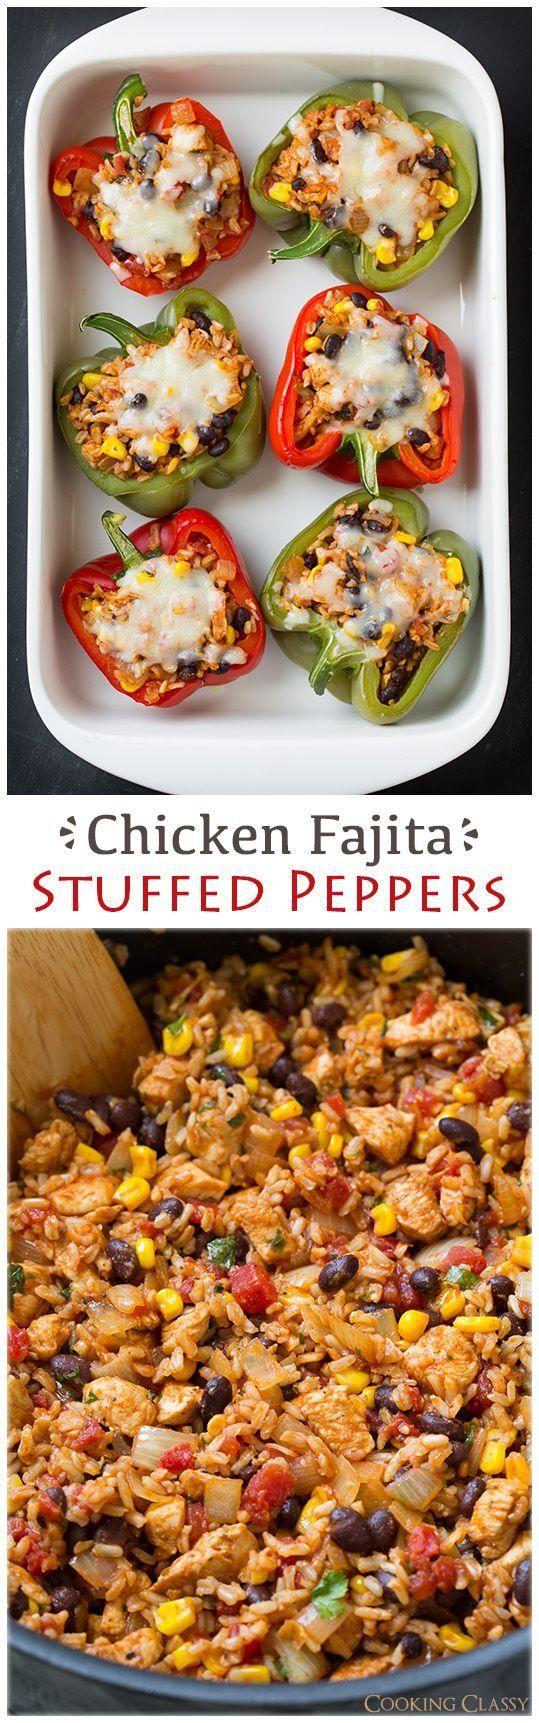 Chicken Fajita Stuffed Peppers.                                                                                                                                                                                 More